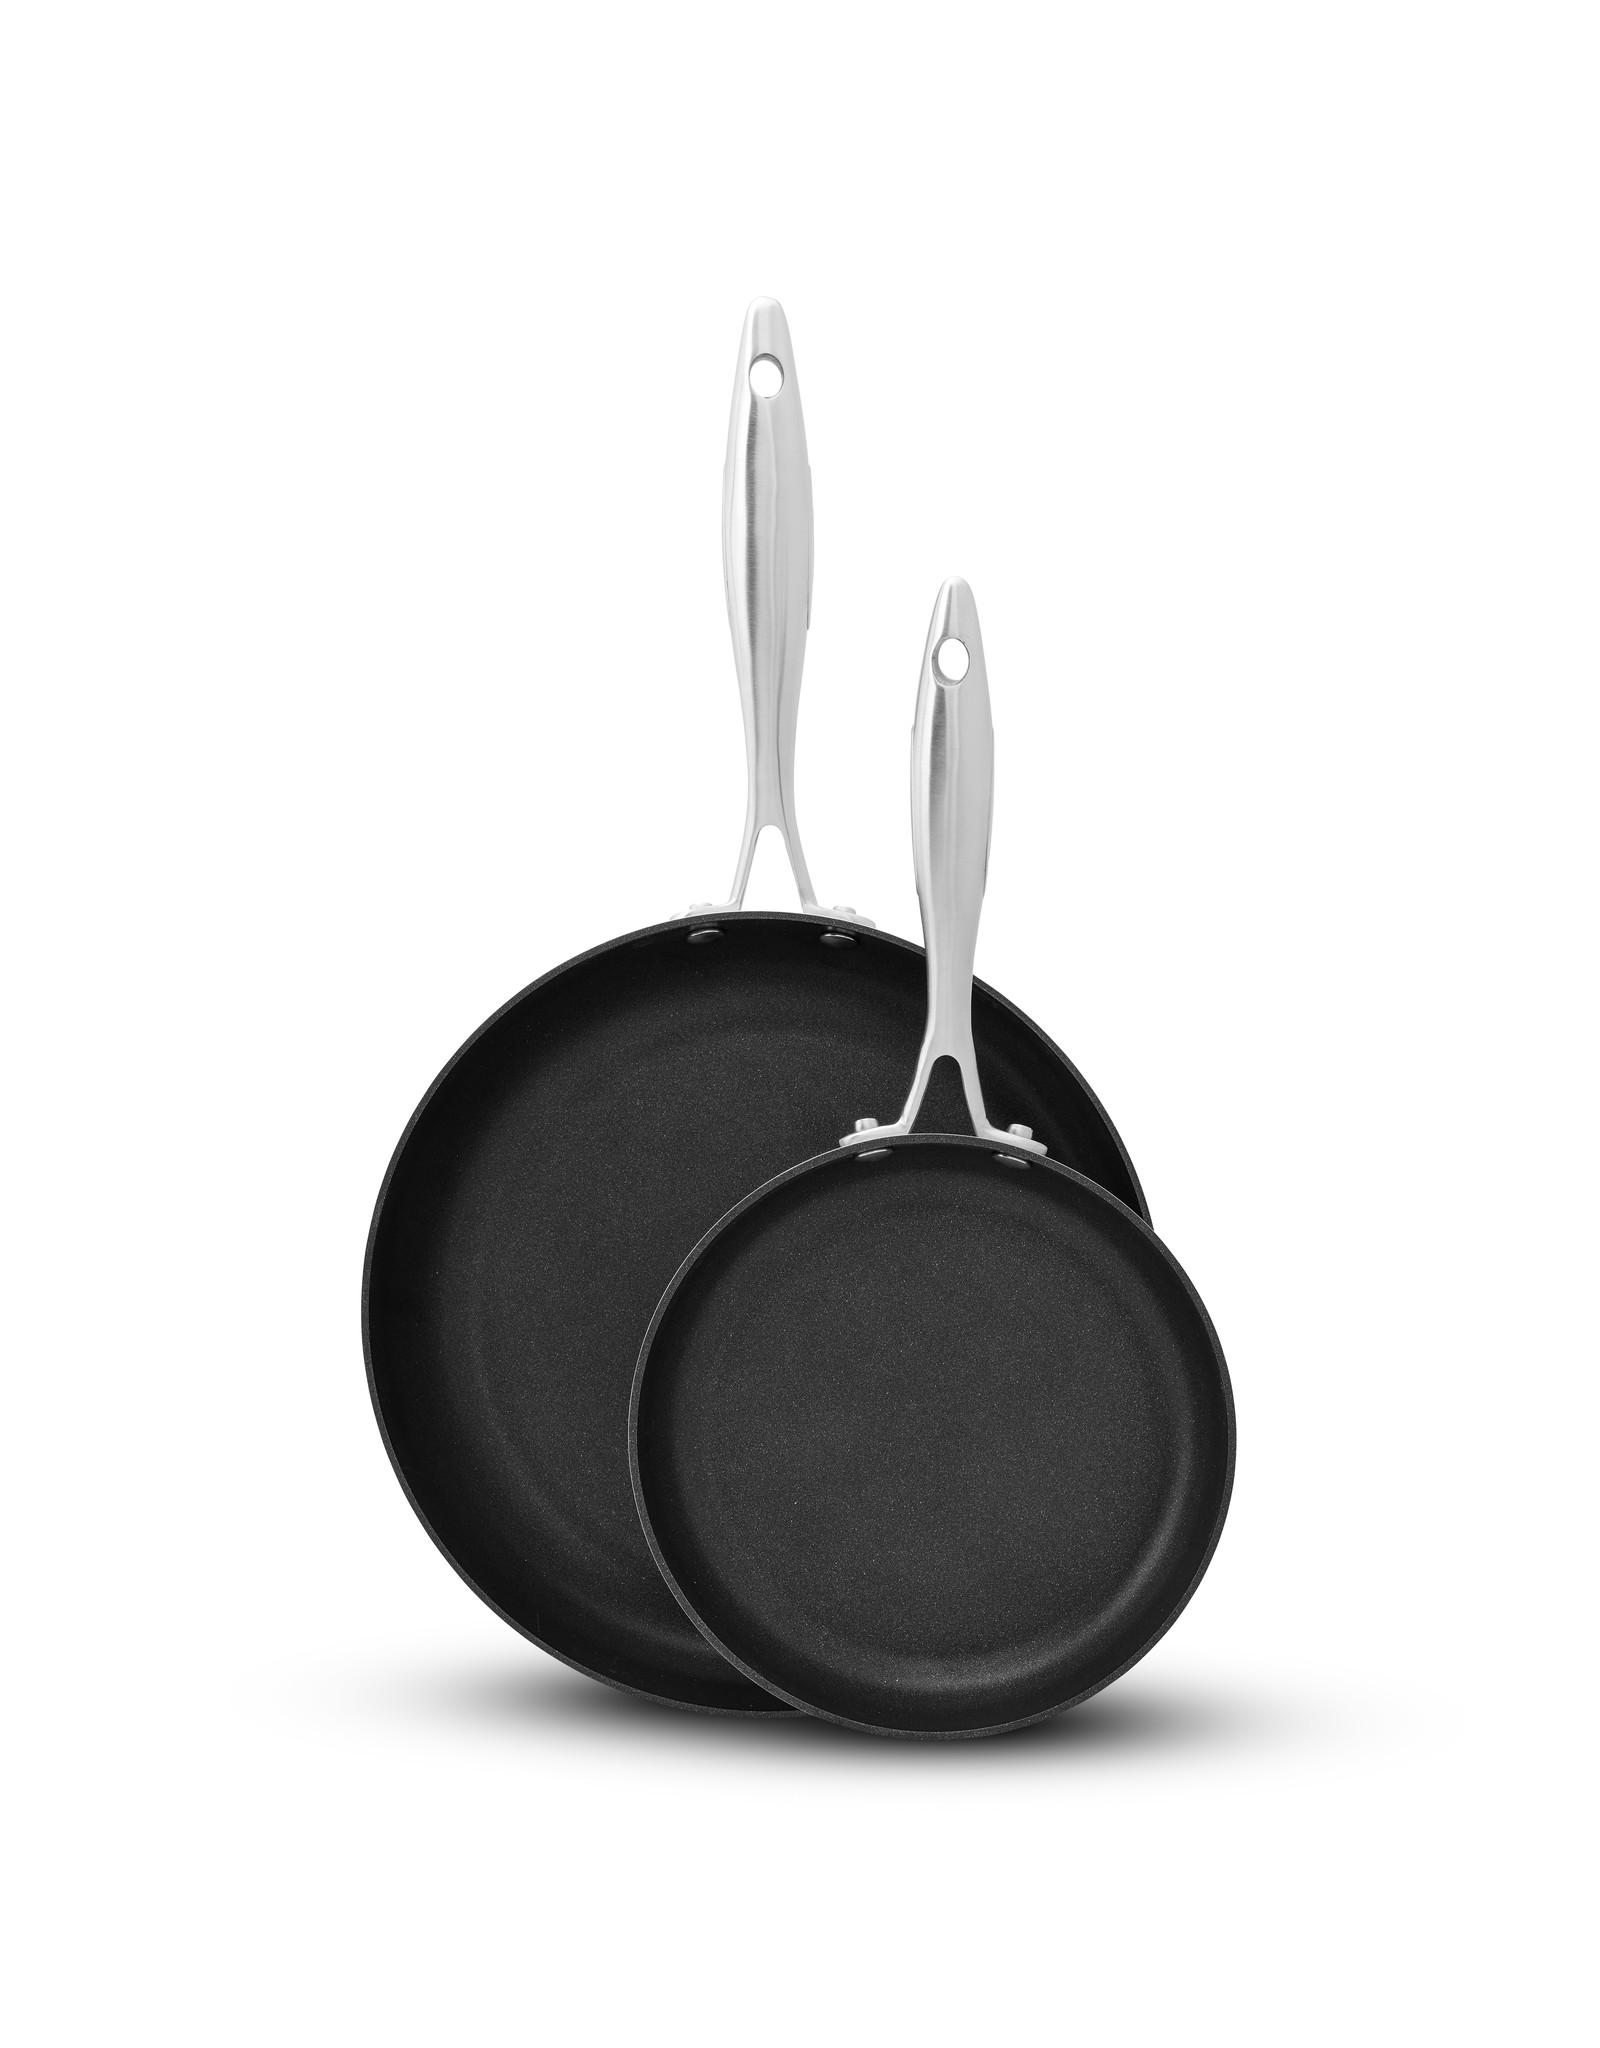 Scanpan Scanpan. Set van 2 koekenpan in hoes, 20 cm + 28